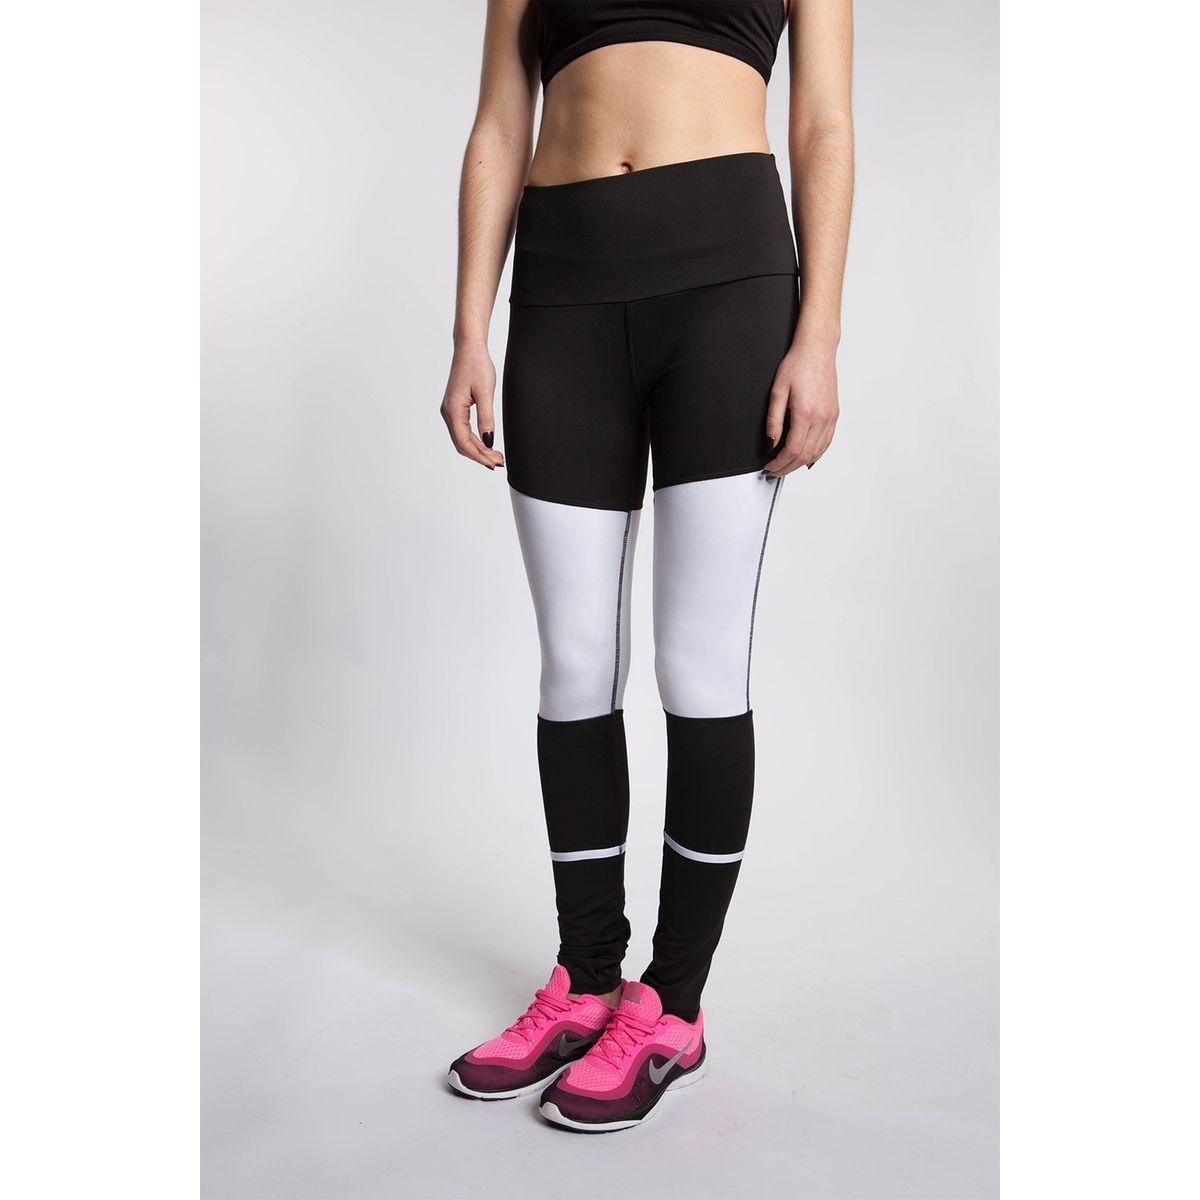 Legging de sport bi-color empiècement